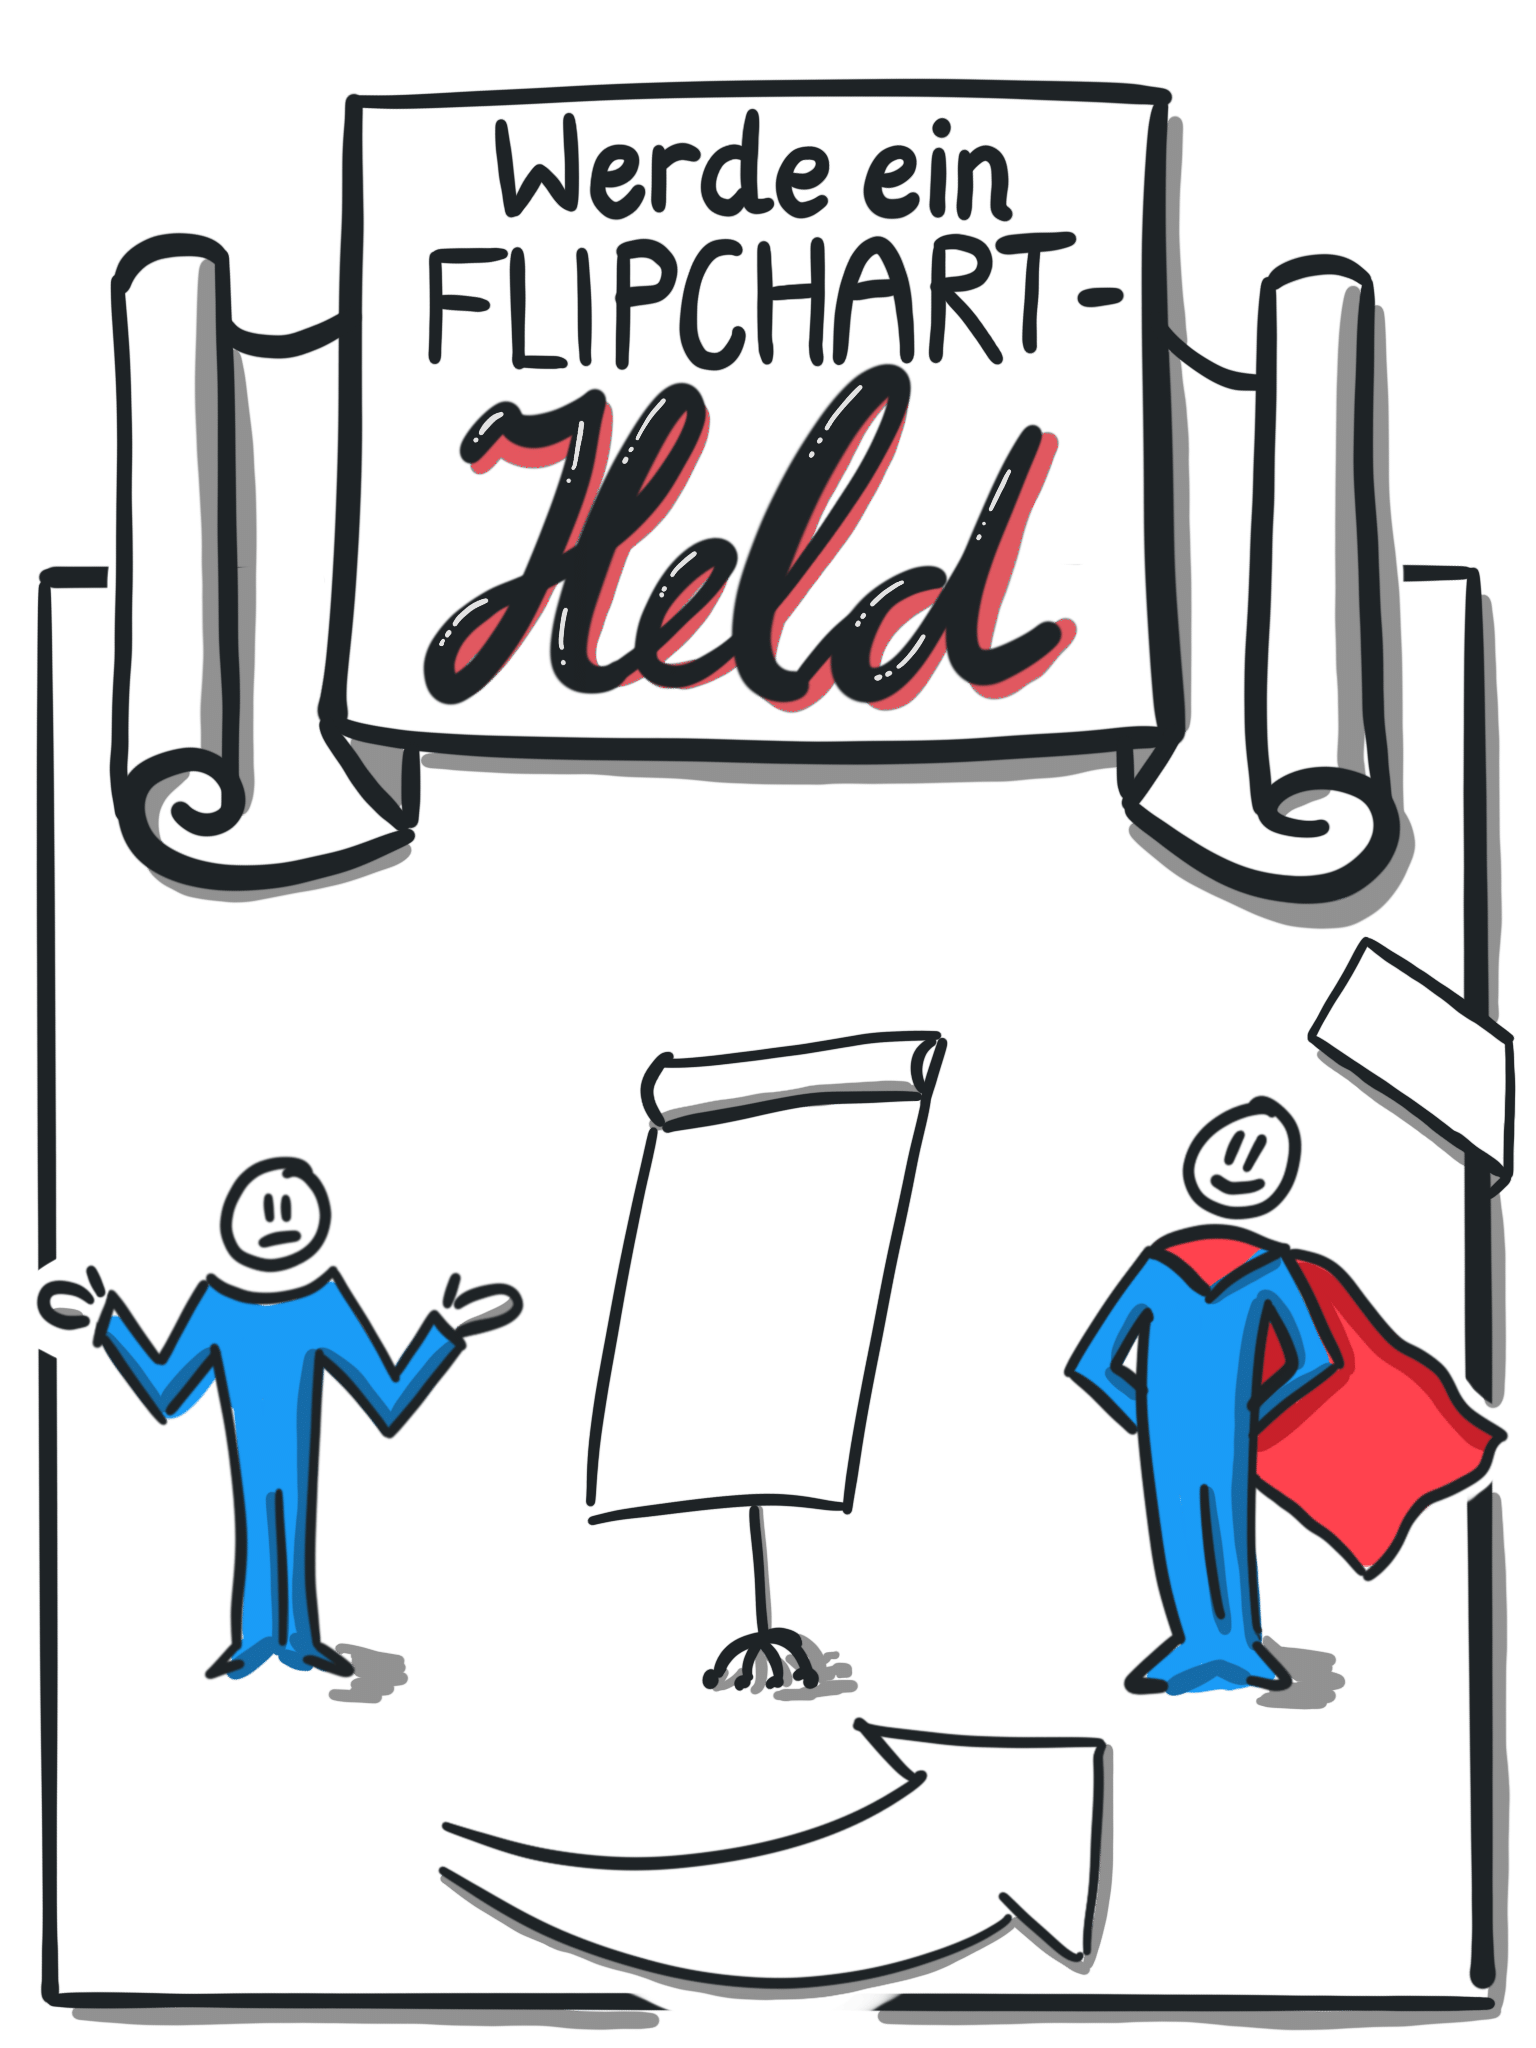 Flipchart Held Mindset Kurs